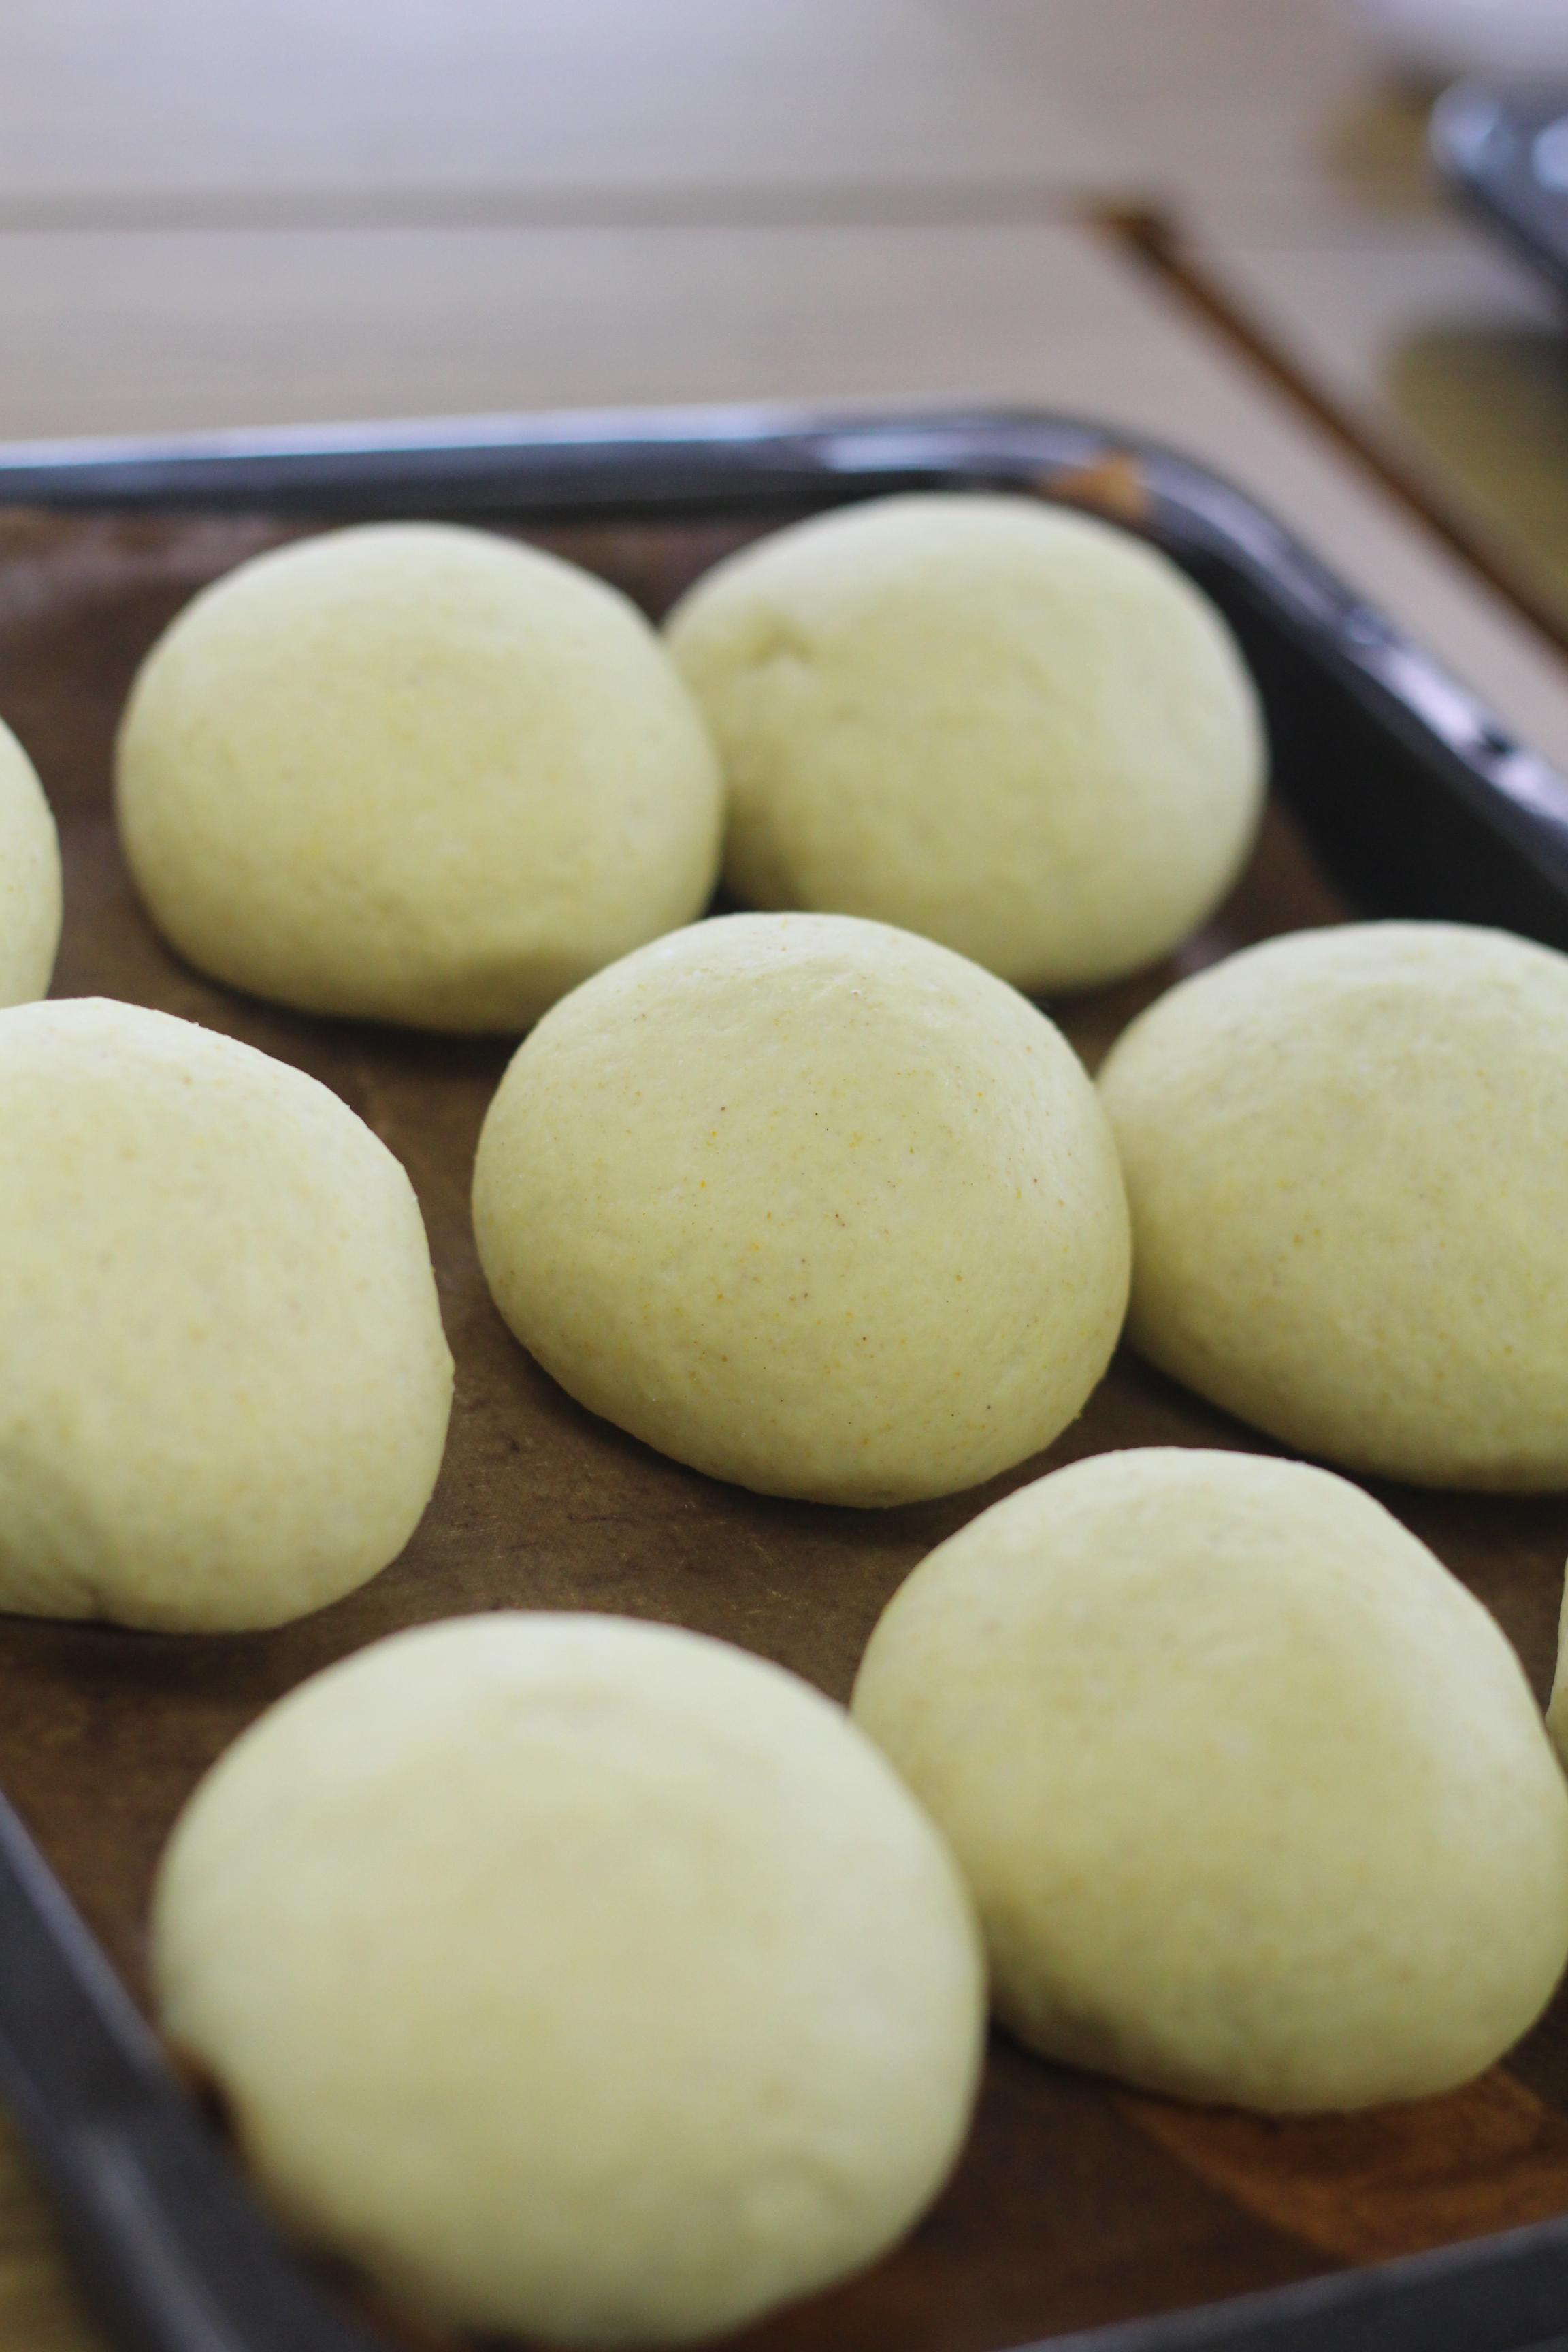 a-ta-sante糖質制限パン料理教室、阿倍野区西田辺。会館でのレッスン『カレーエピ』